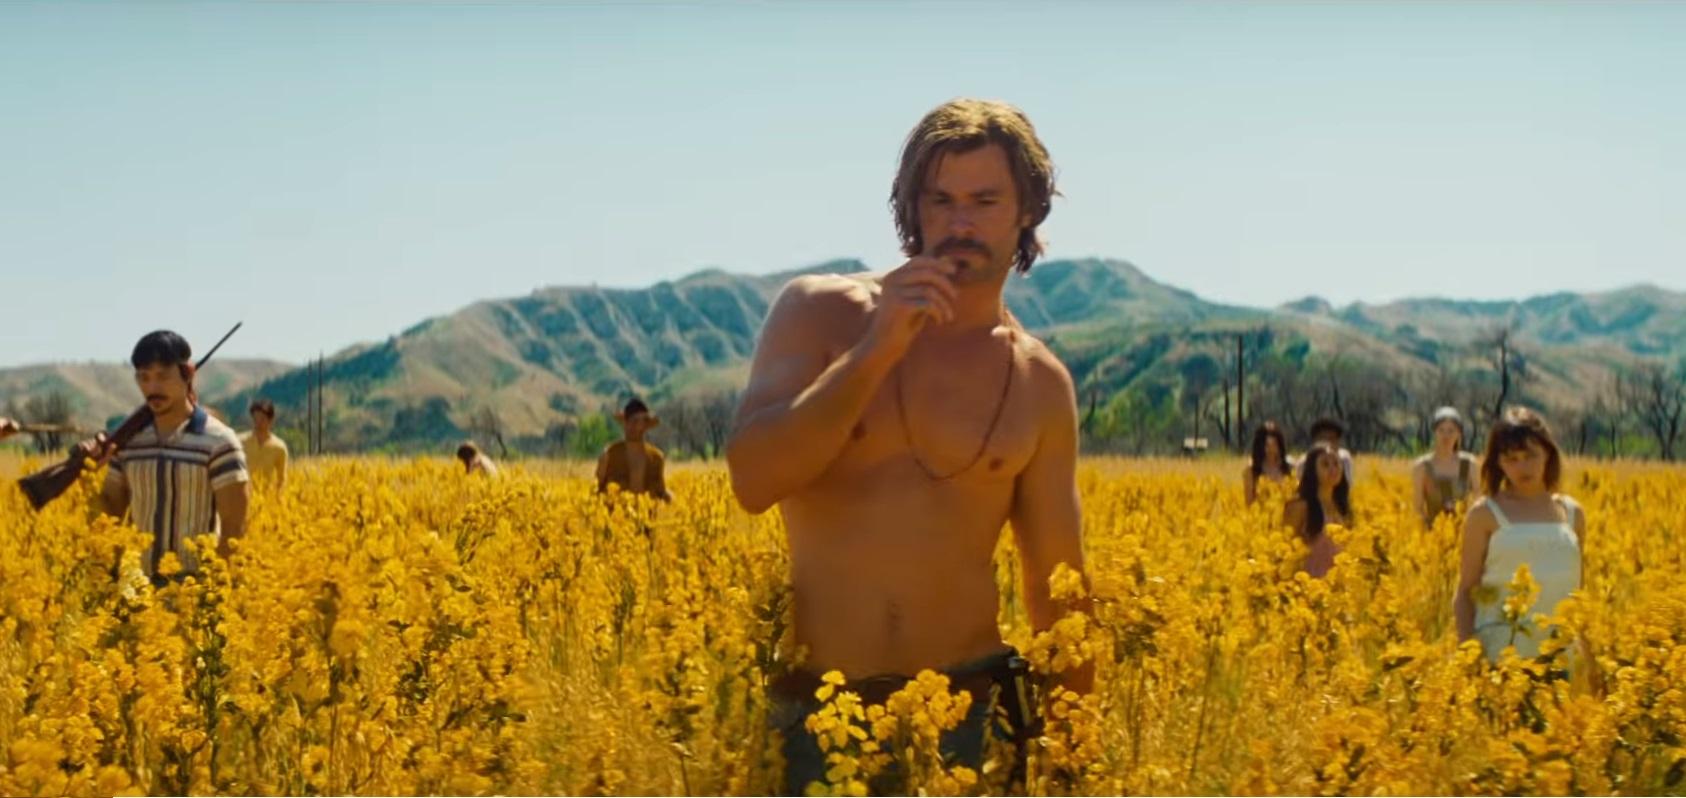 Chris Hemsworth at El Royale